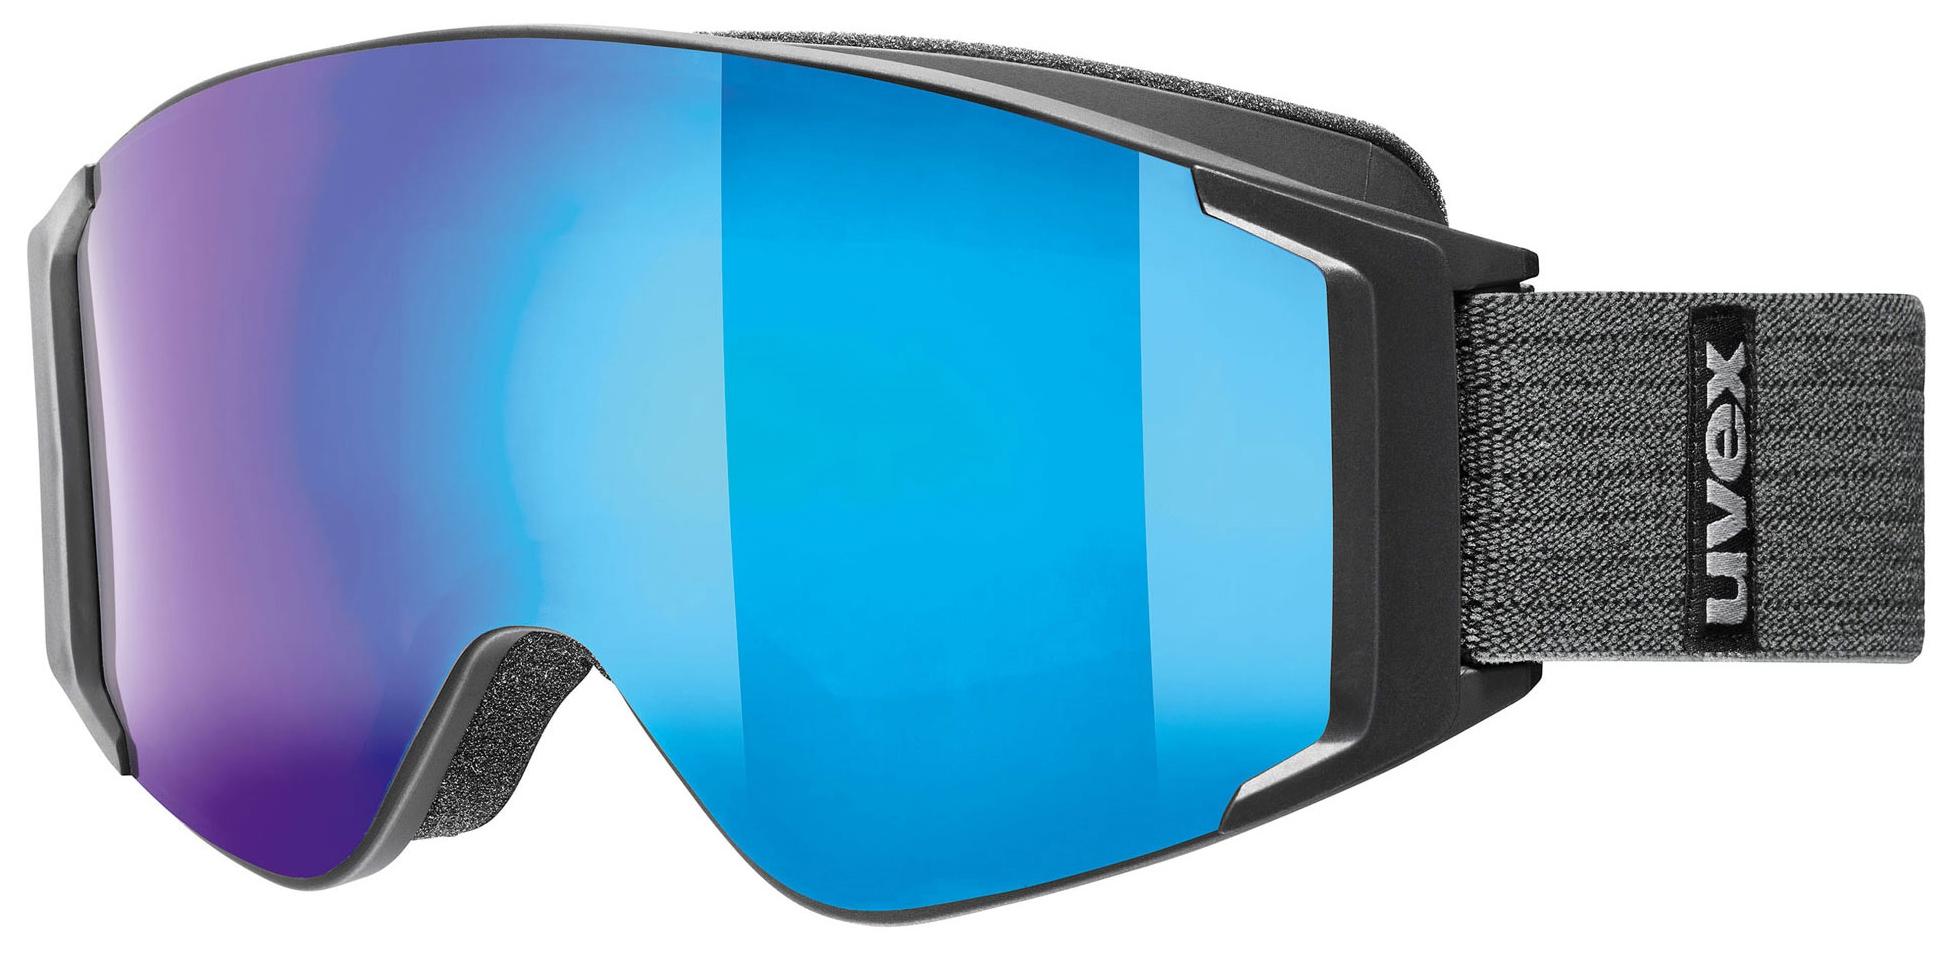 Uvex G.GL 3000 TOP Mirror Blue 4030